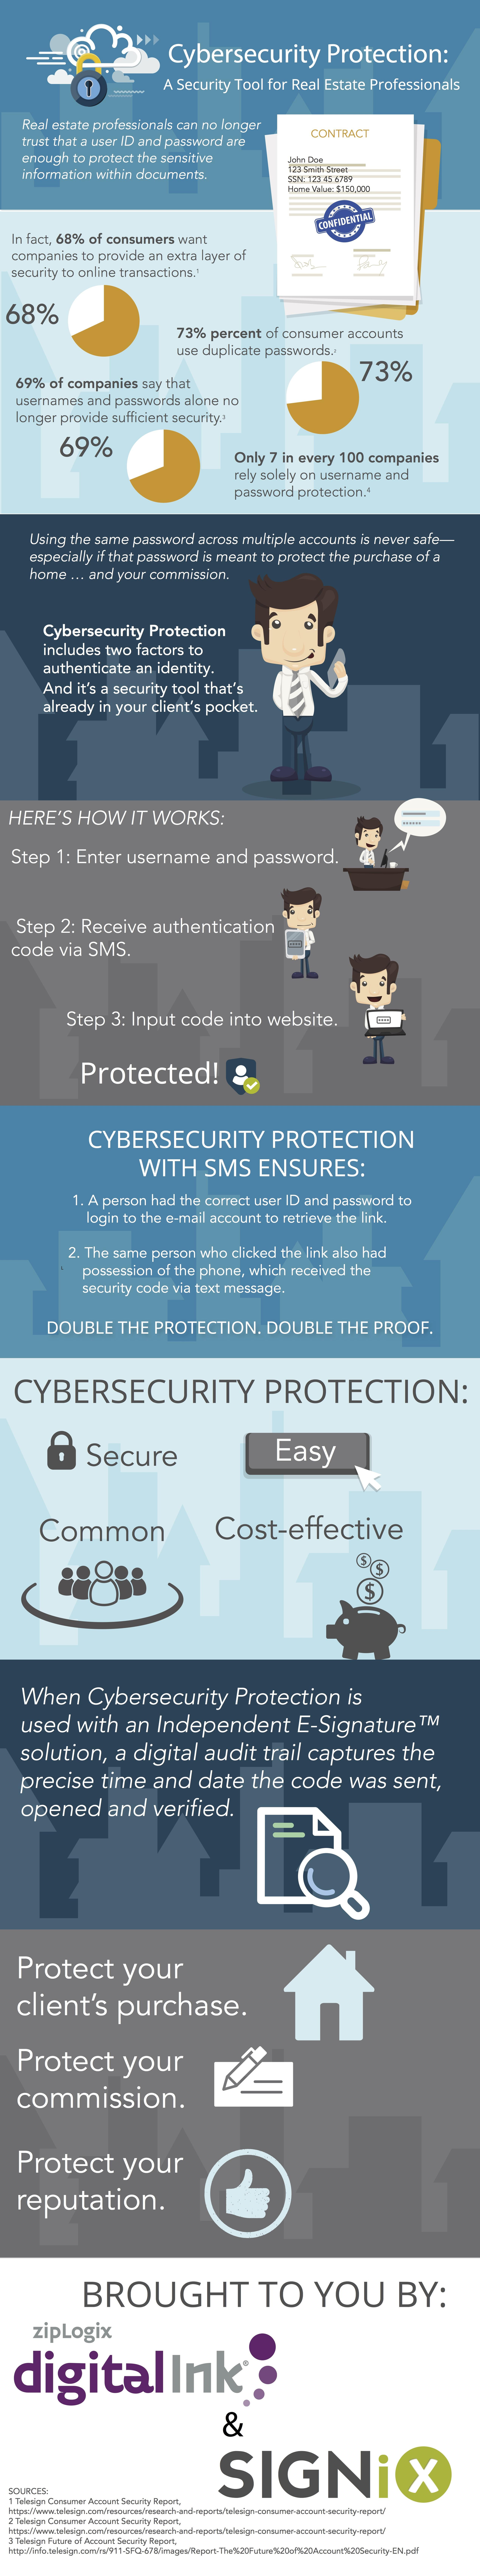 Cybersecurity Protection for zipLogix (1).jpg